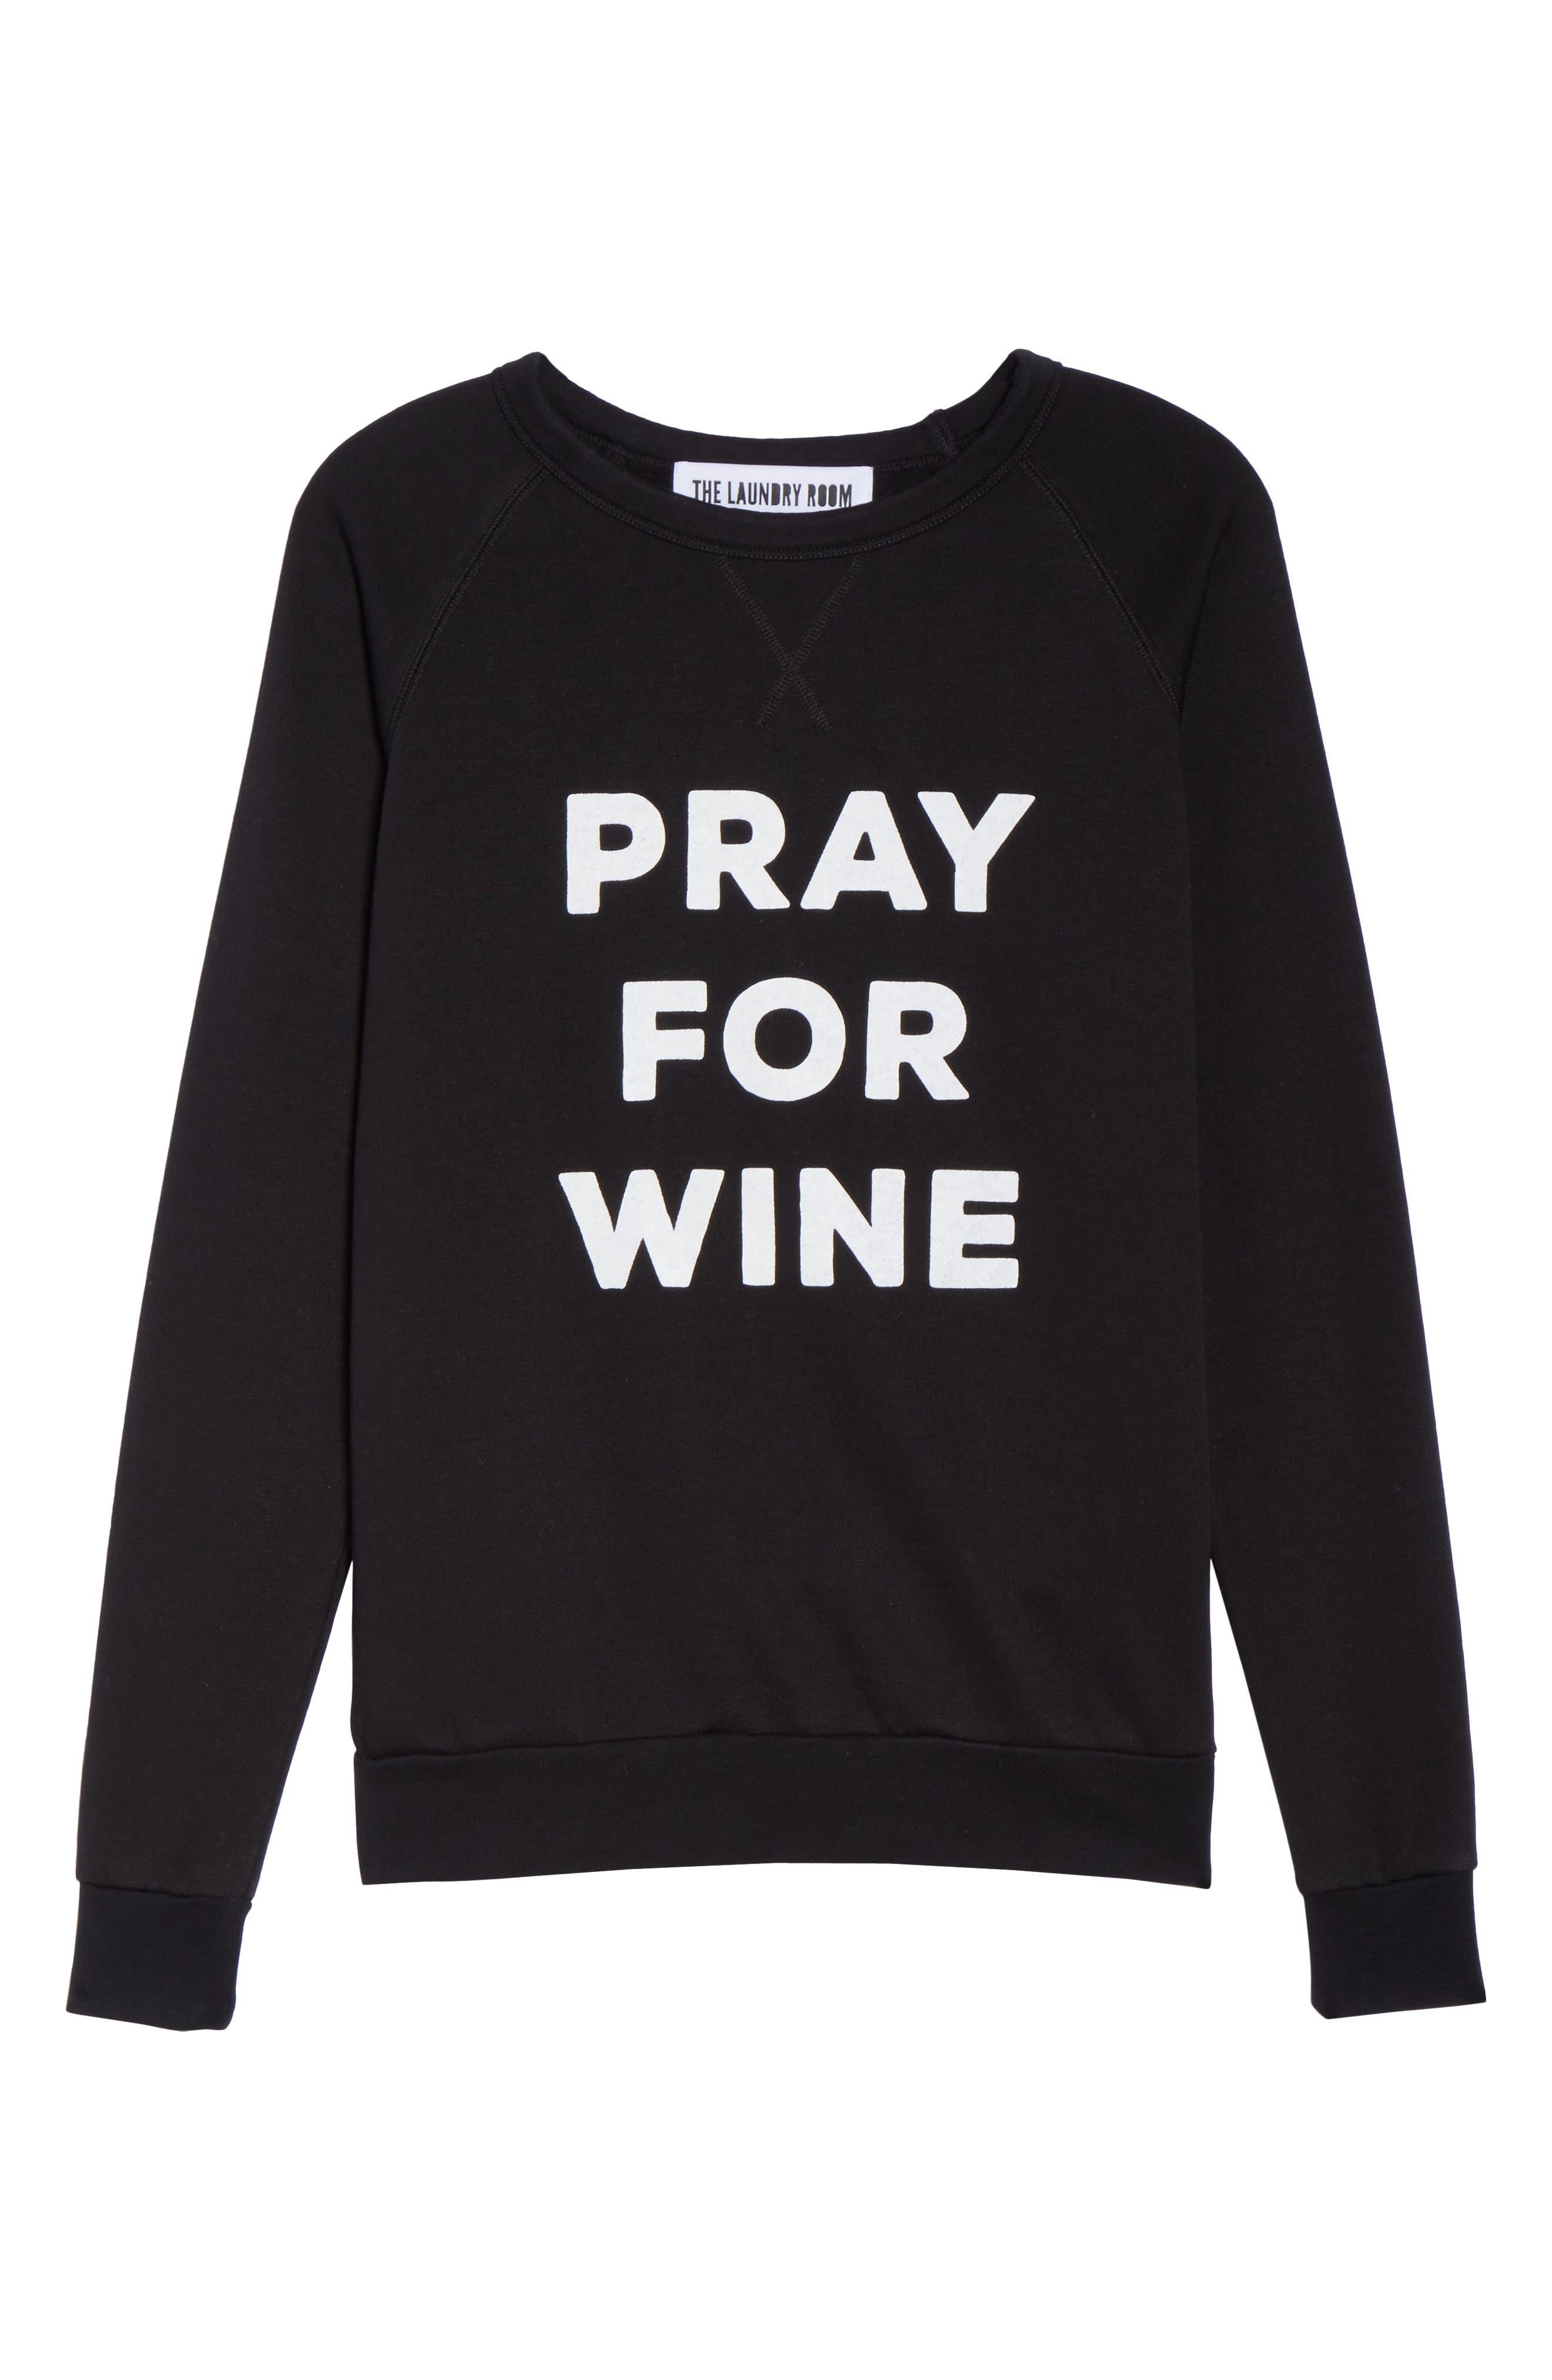 Pray For Wine Sweatshirt,                             Alternate thumbnail 6, color,                             Black